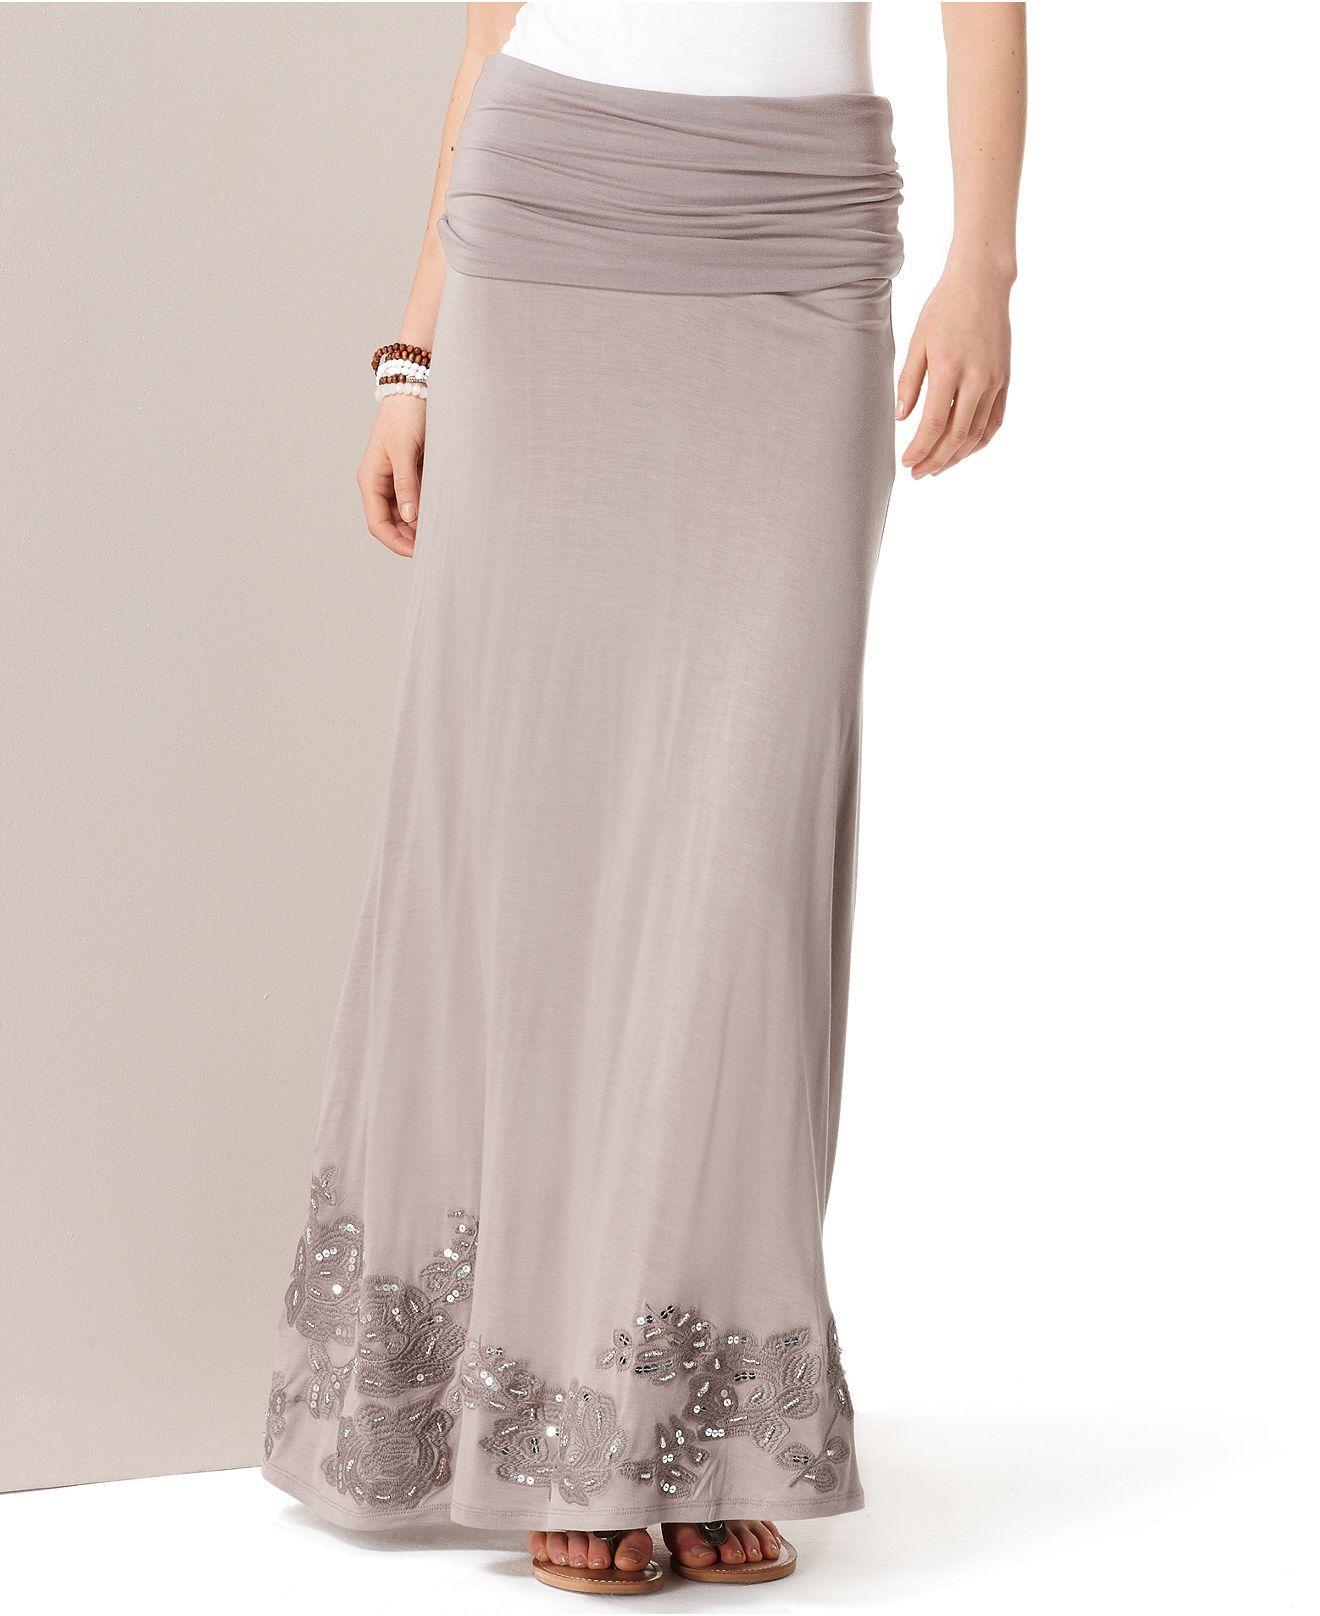 d5f5923a83fb INC International Concepts Skirt, Convertible Maxi Embroidered Strapless  Dress